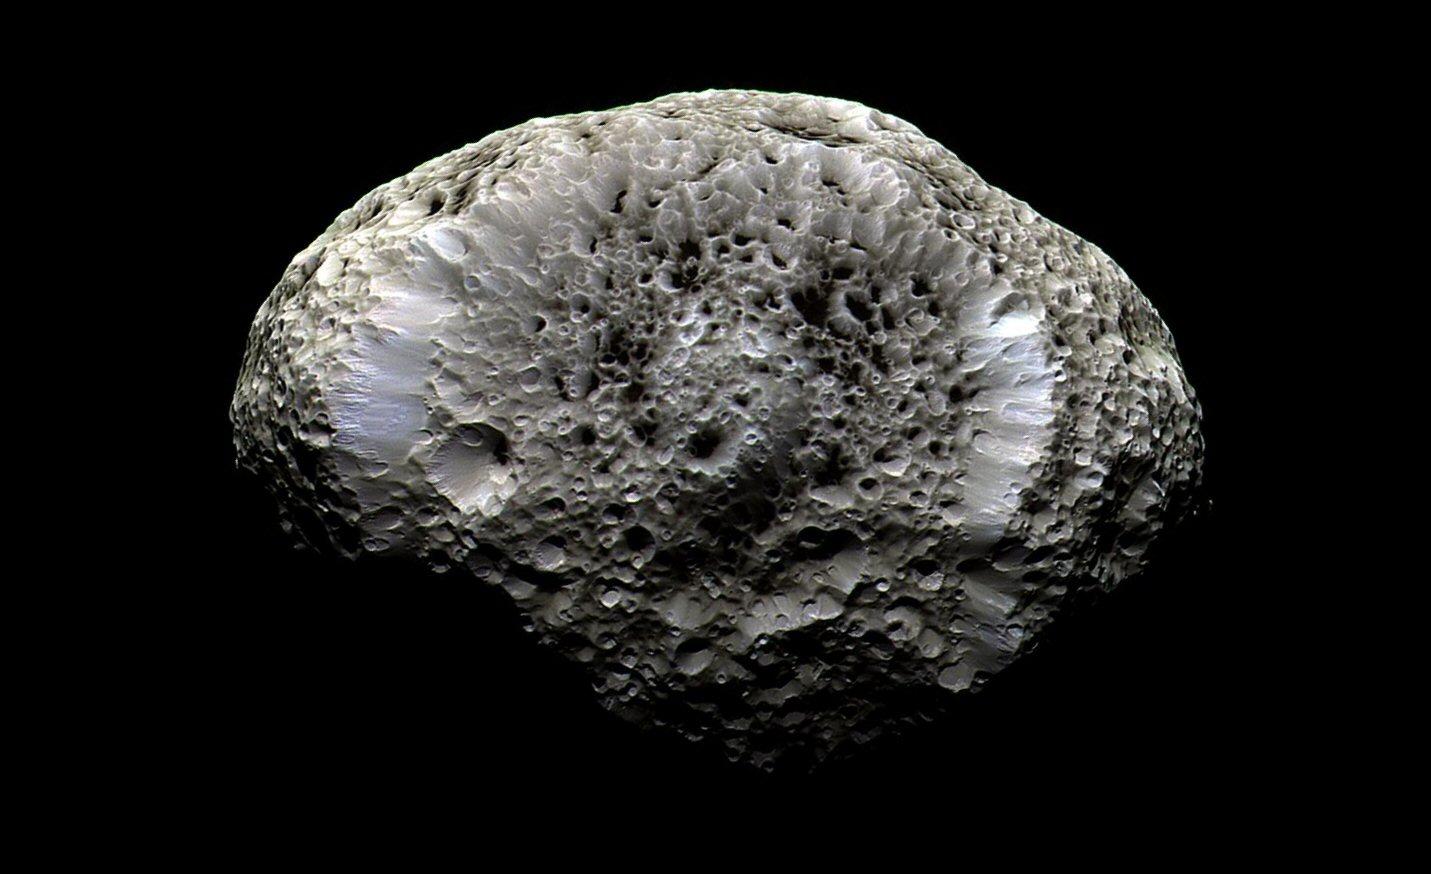 Hyperion - satellite of Saturn